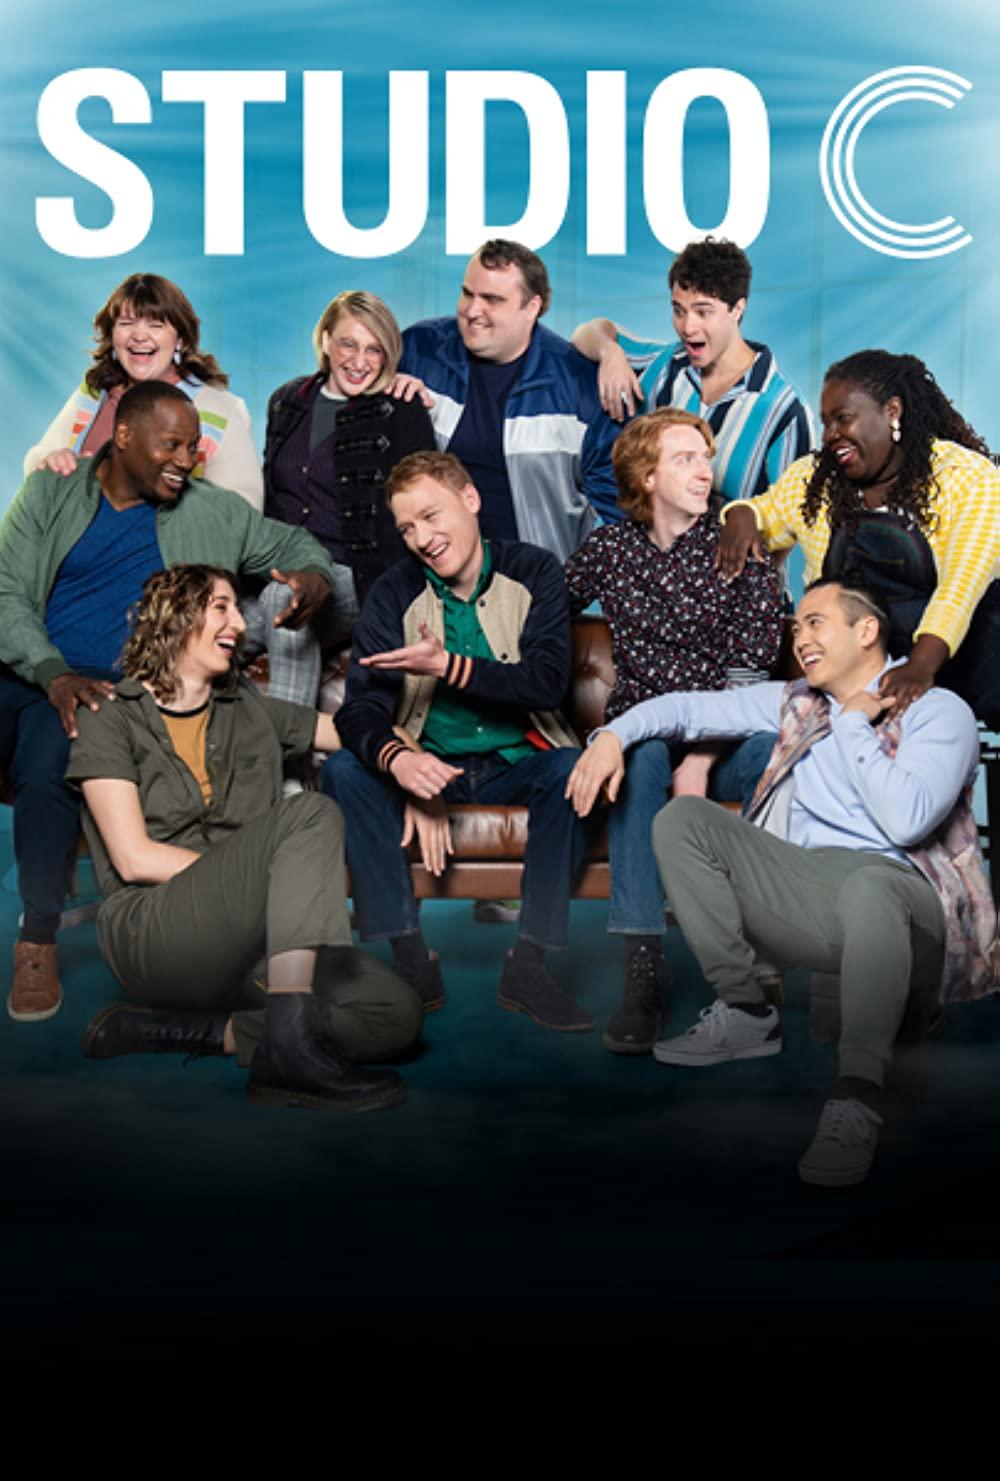 Studio C poster